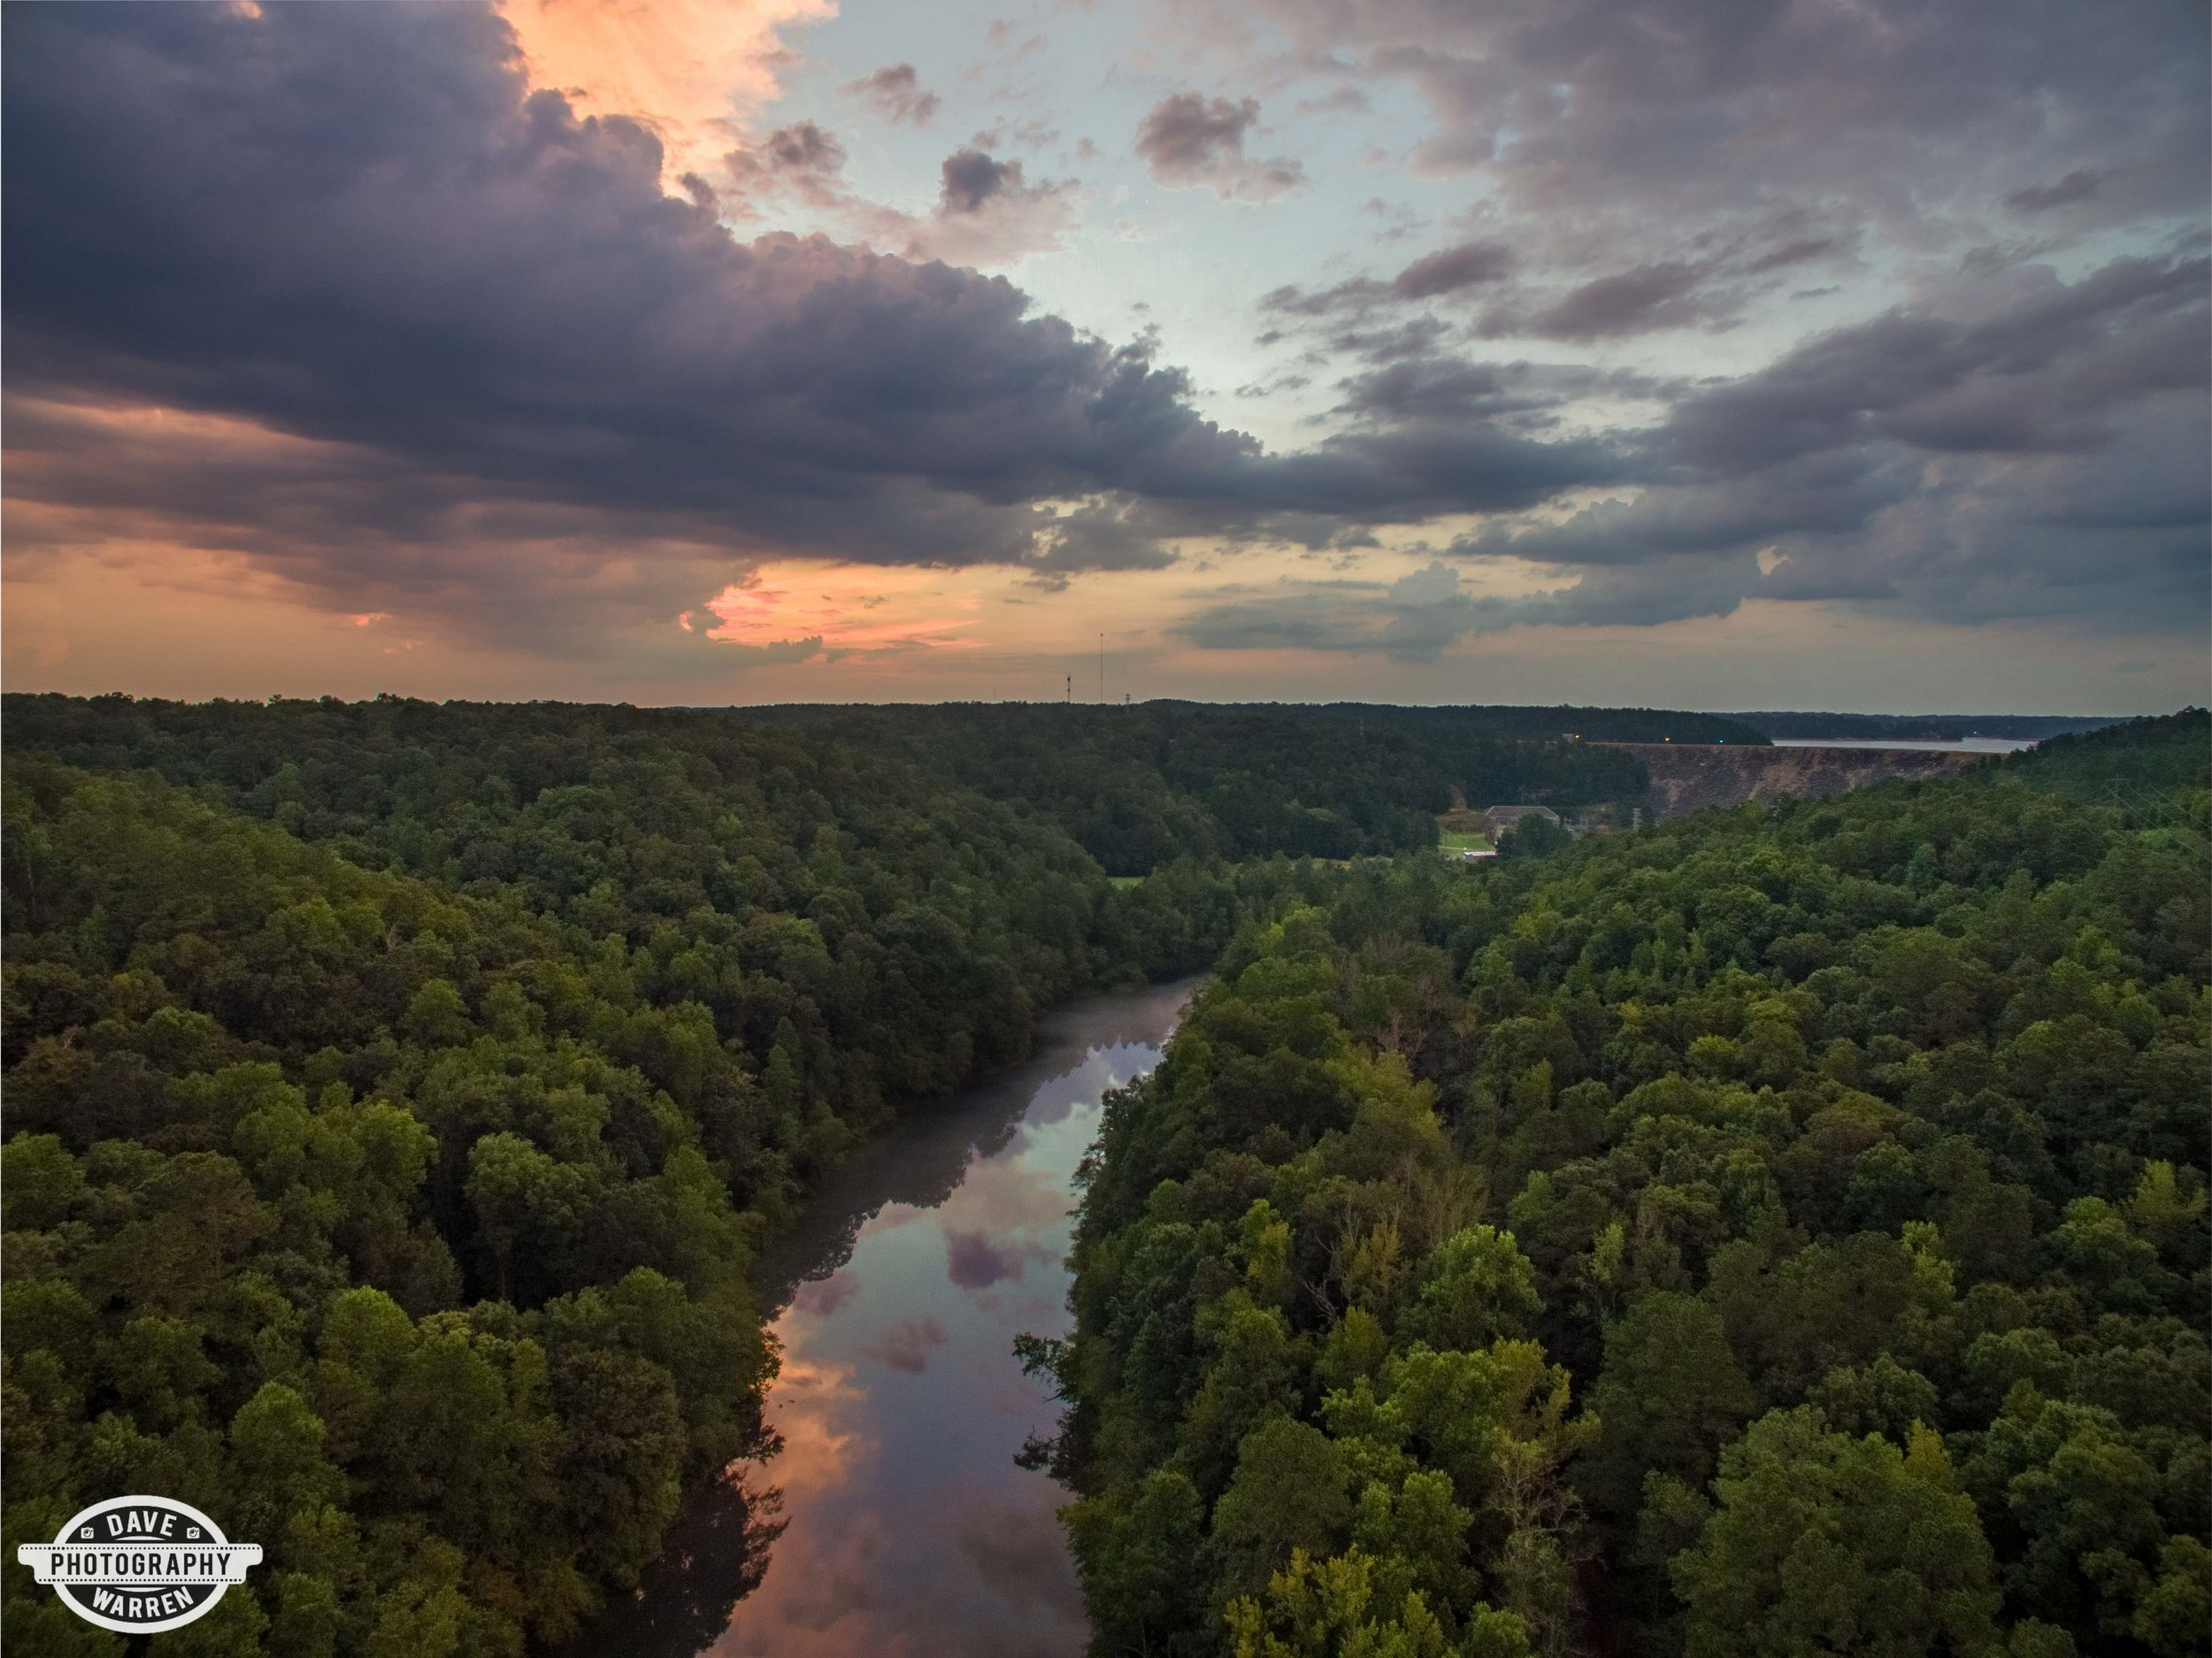 Sipsey Fork of the Black Warrior River